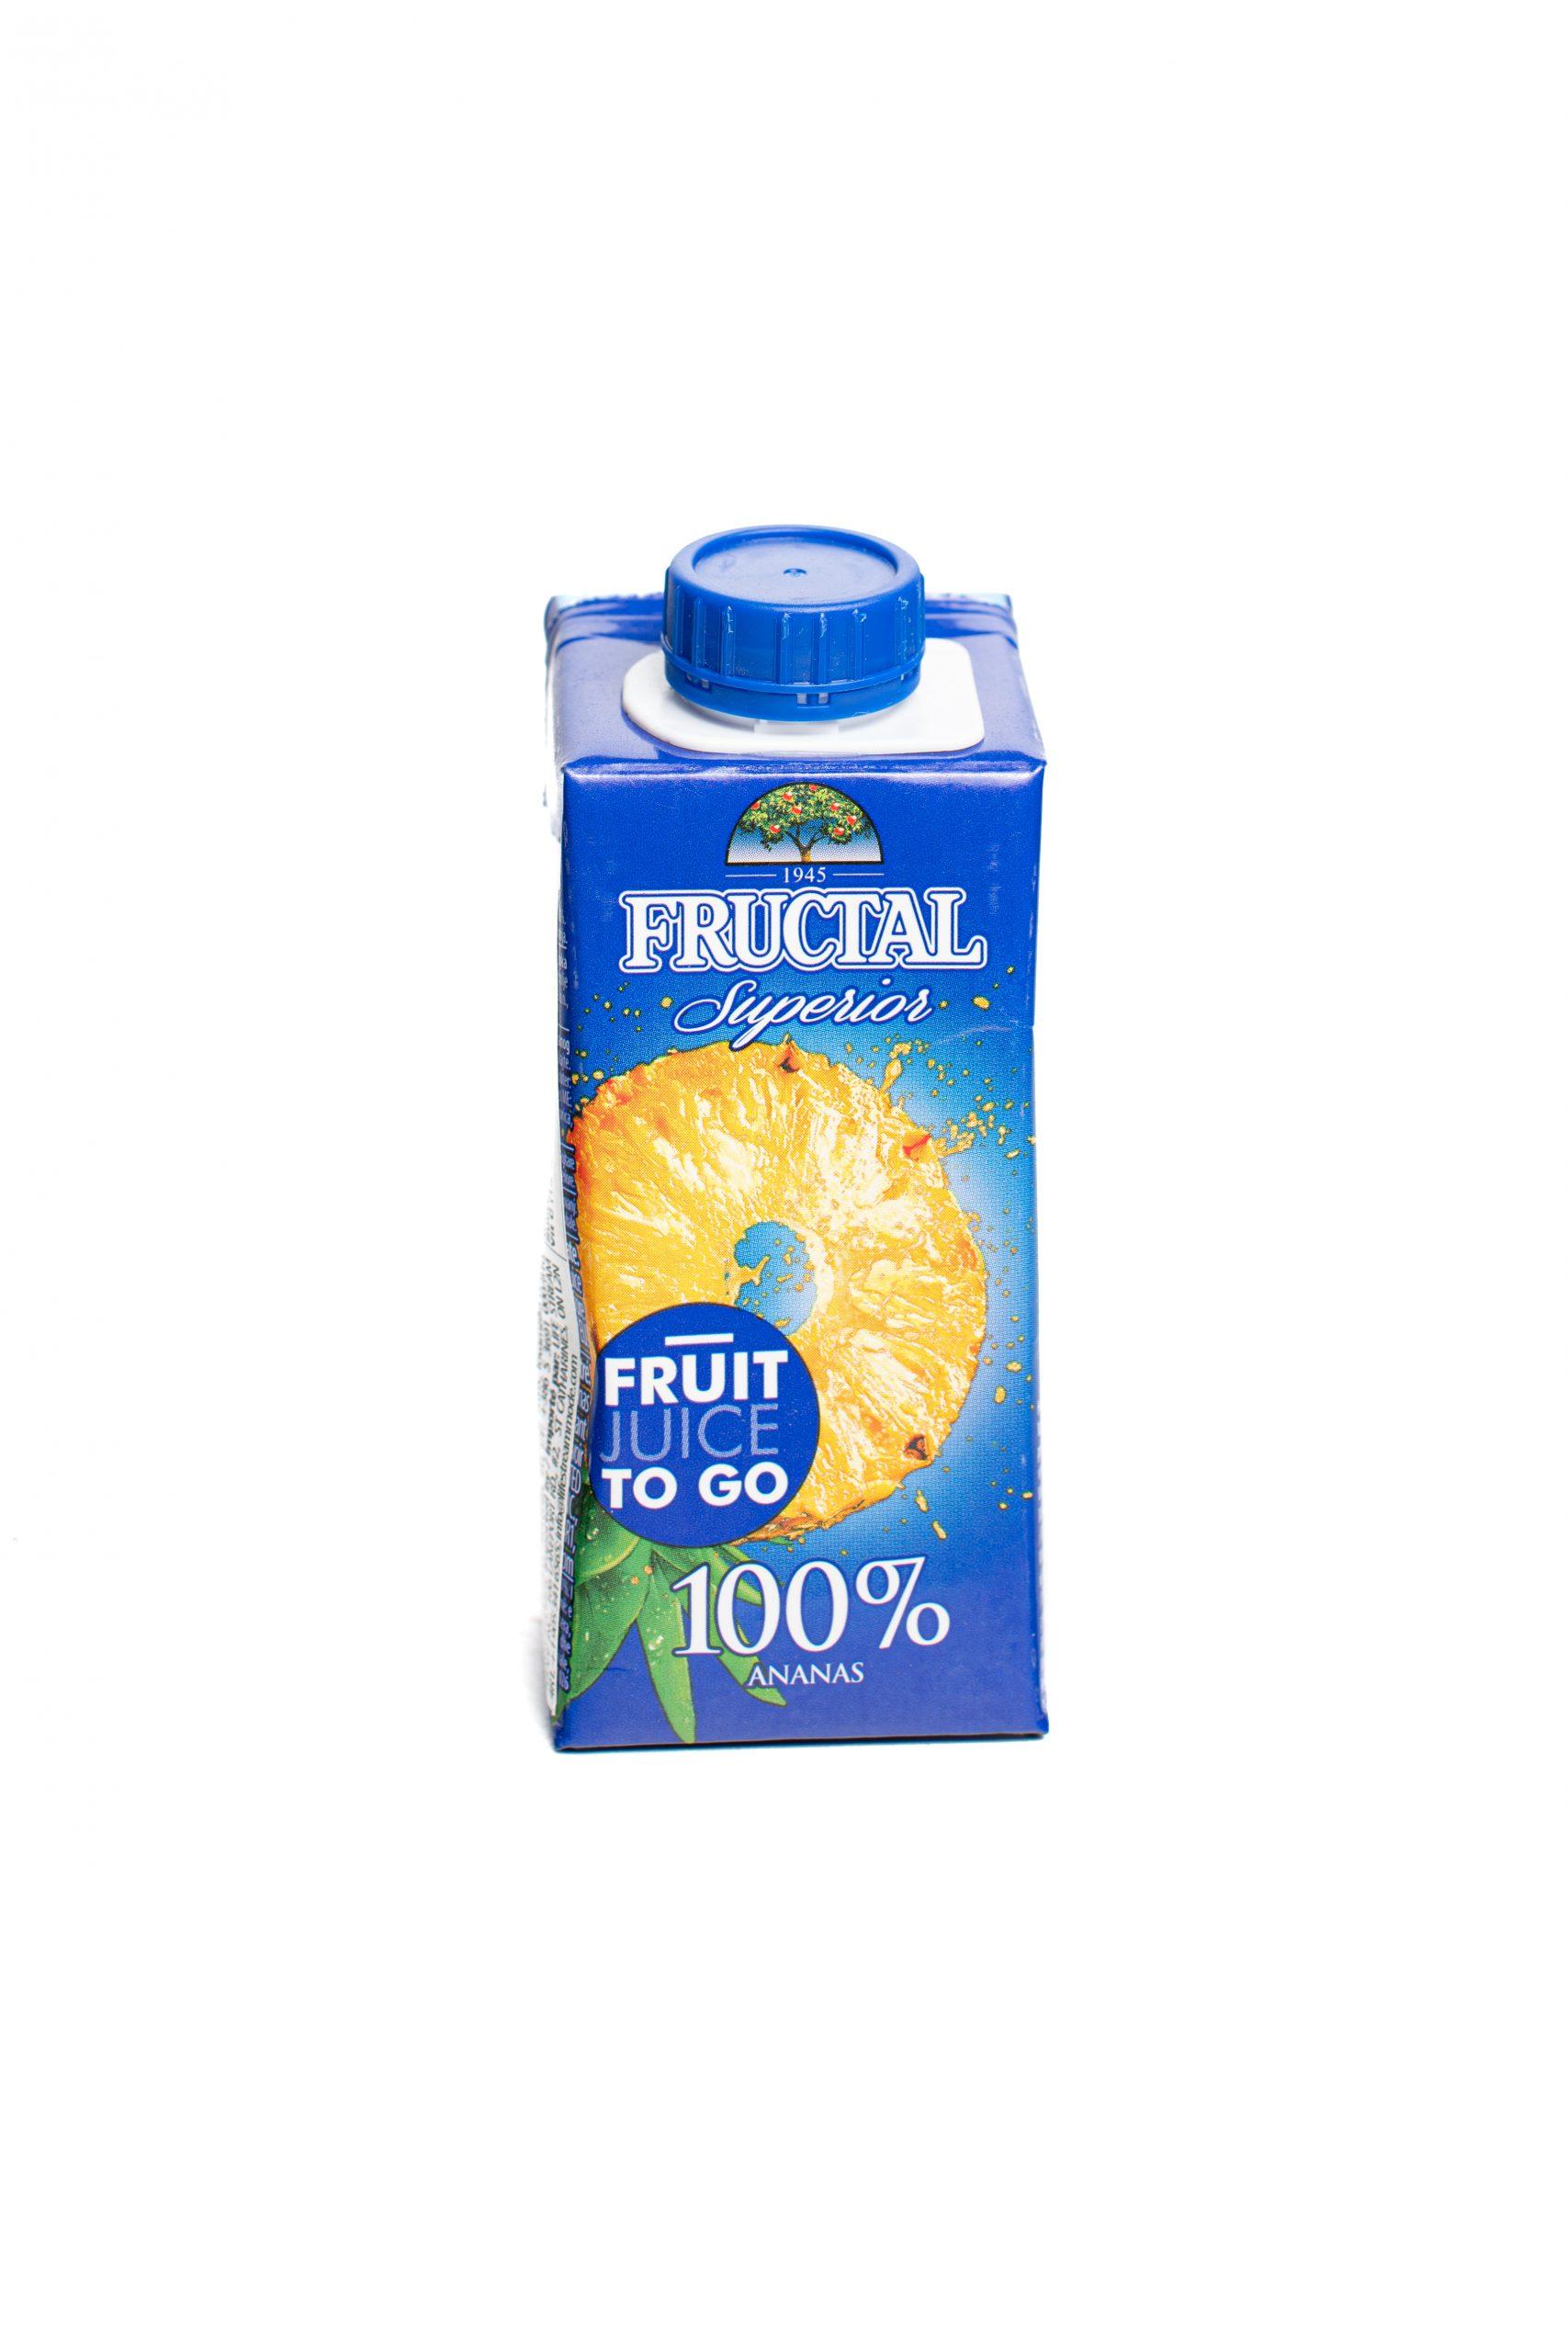 Fructal Tetra Edge | 200 ml | Pineapple